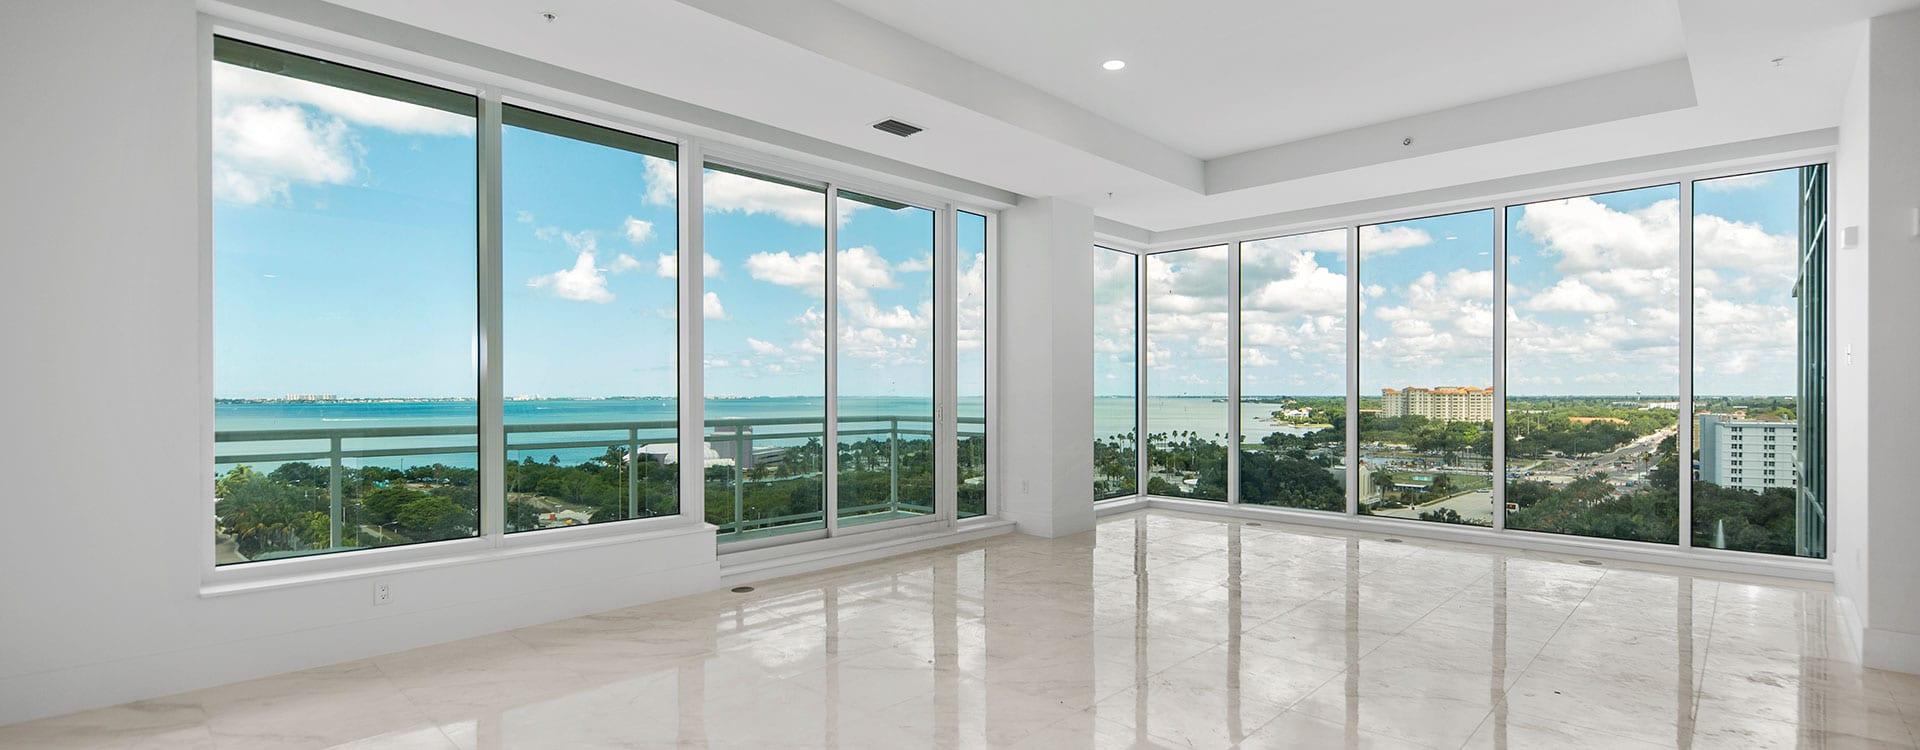 BLVD Sarasota Residence 1102 Great Room with view of the sarasota bayfront